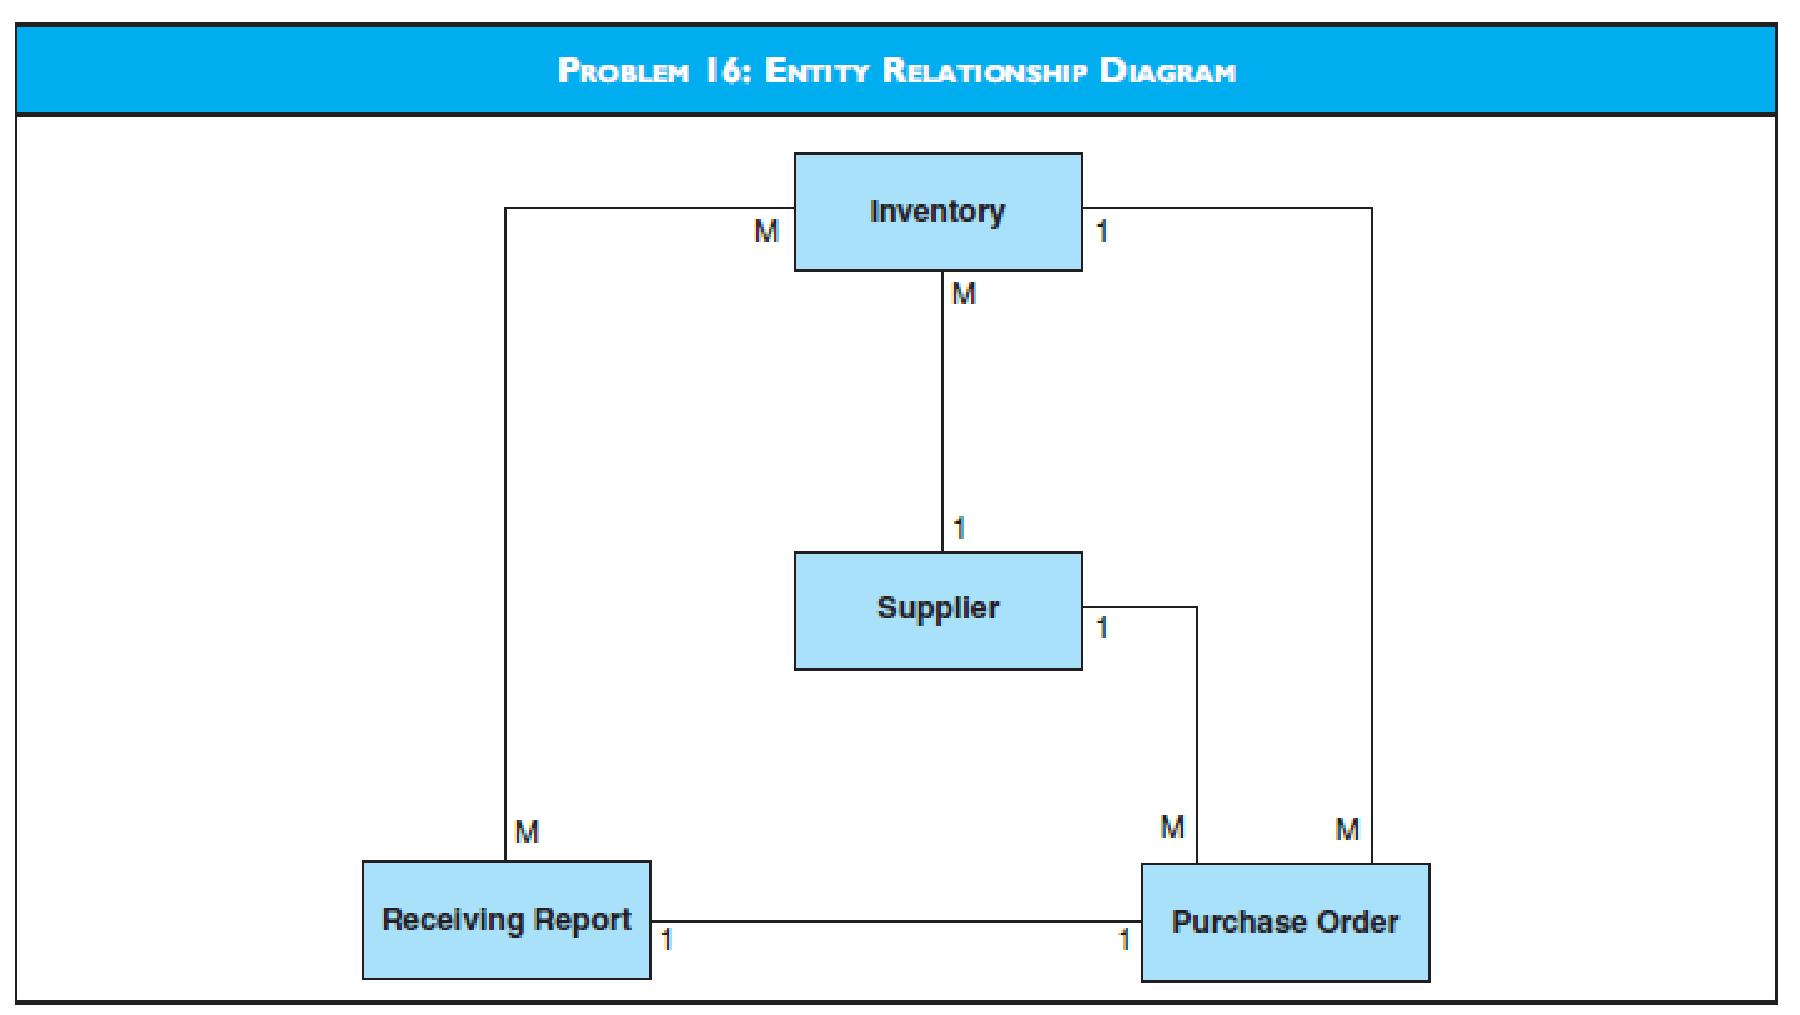 The Diagram Labeled Problem 16 Presents A Partial Entity